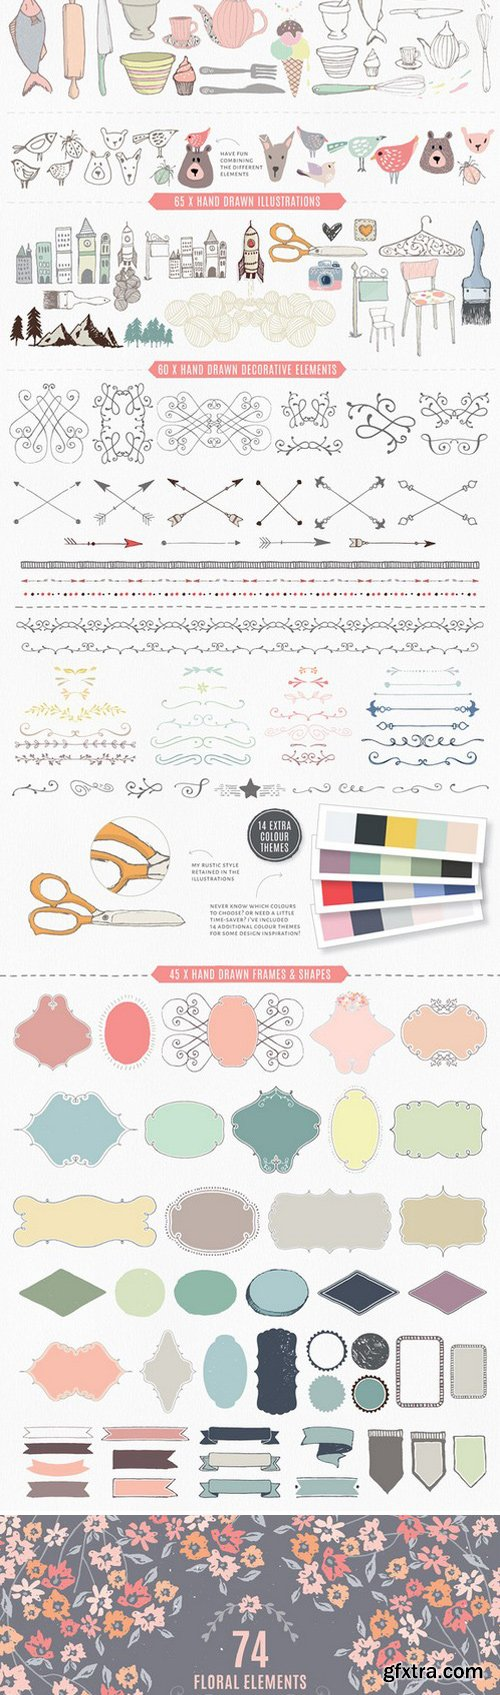 CM - Essential Branding & Identity kit 322545